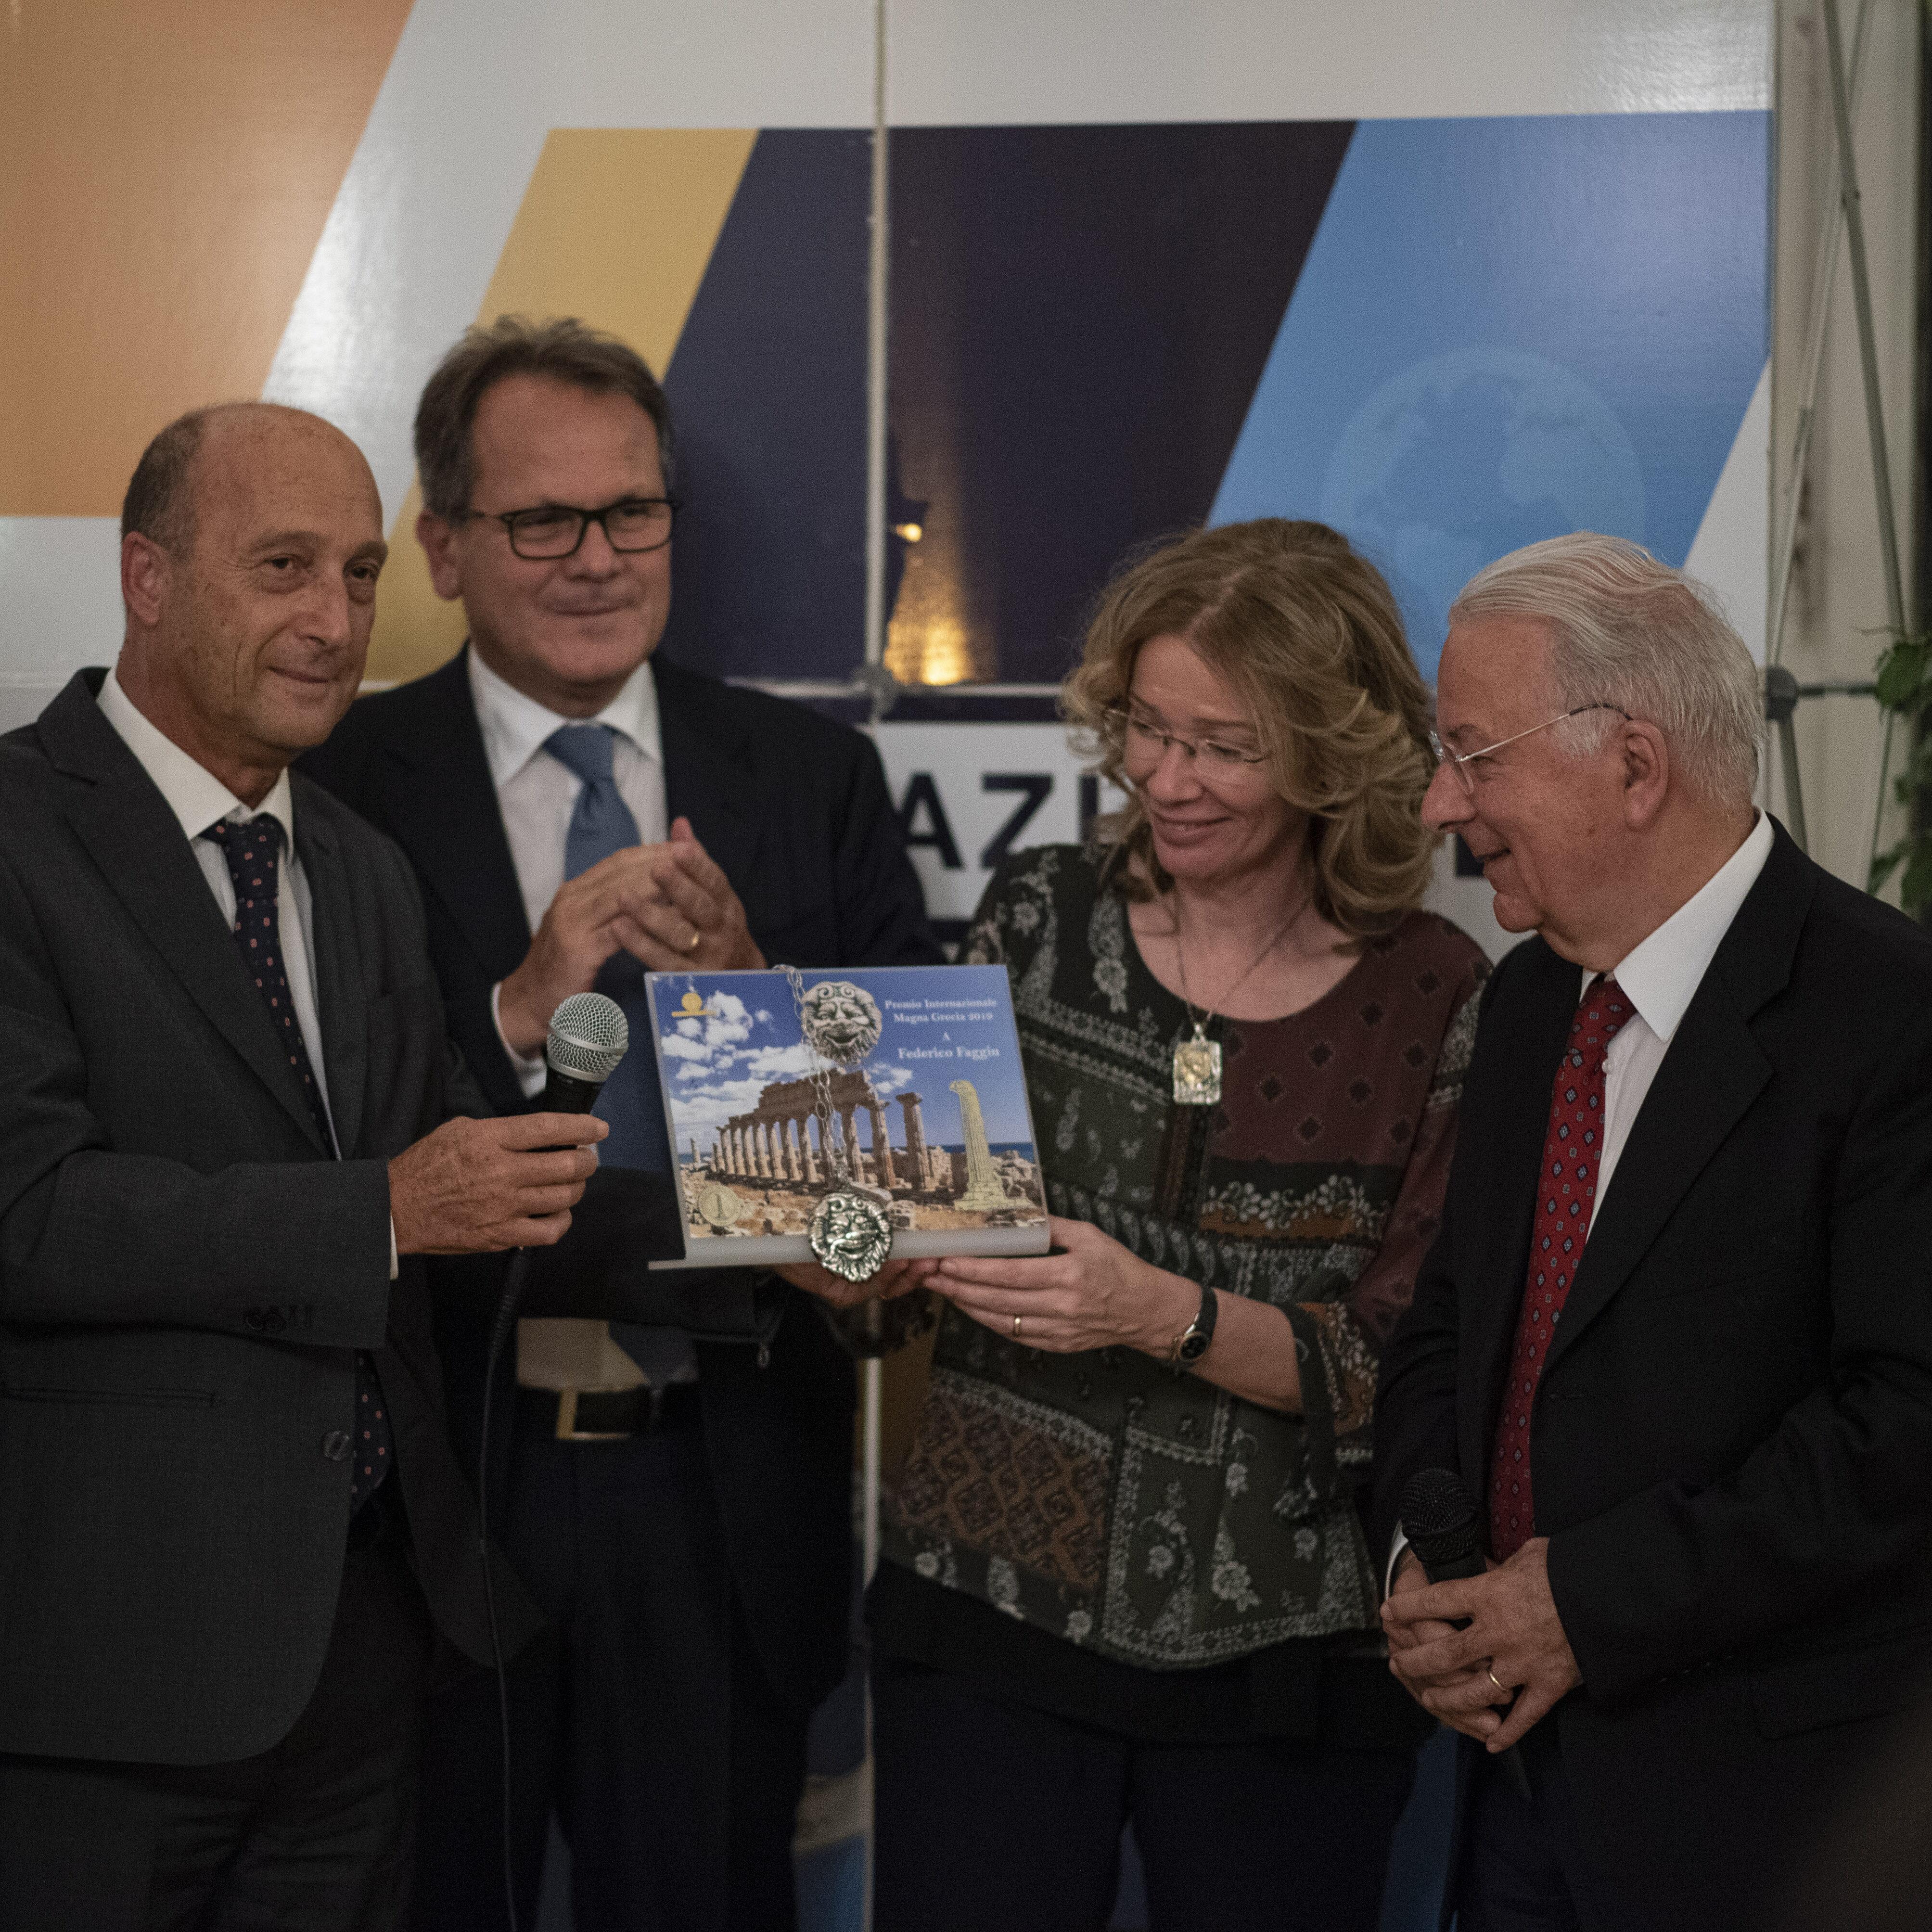 Premio-MG-2019-_-11